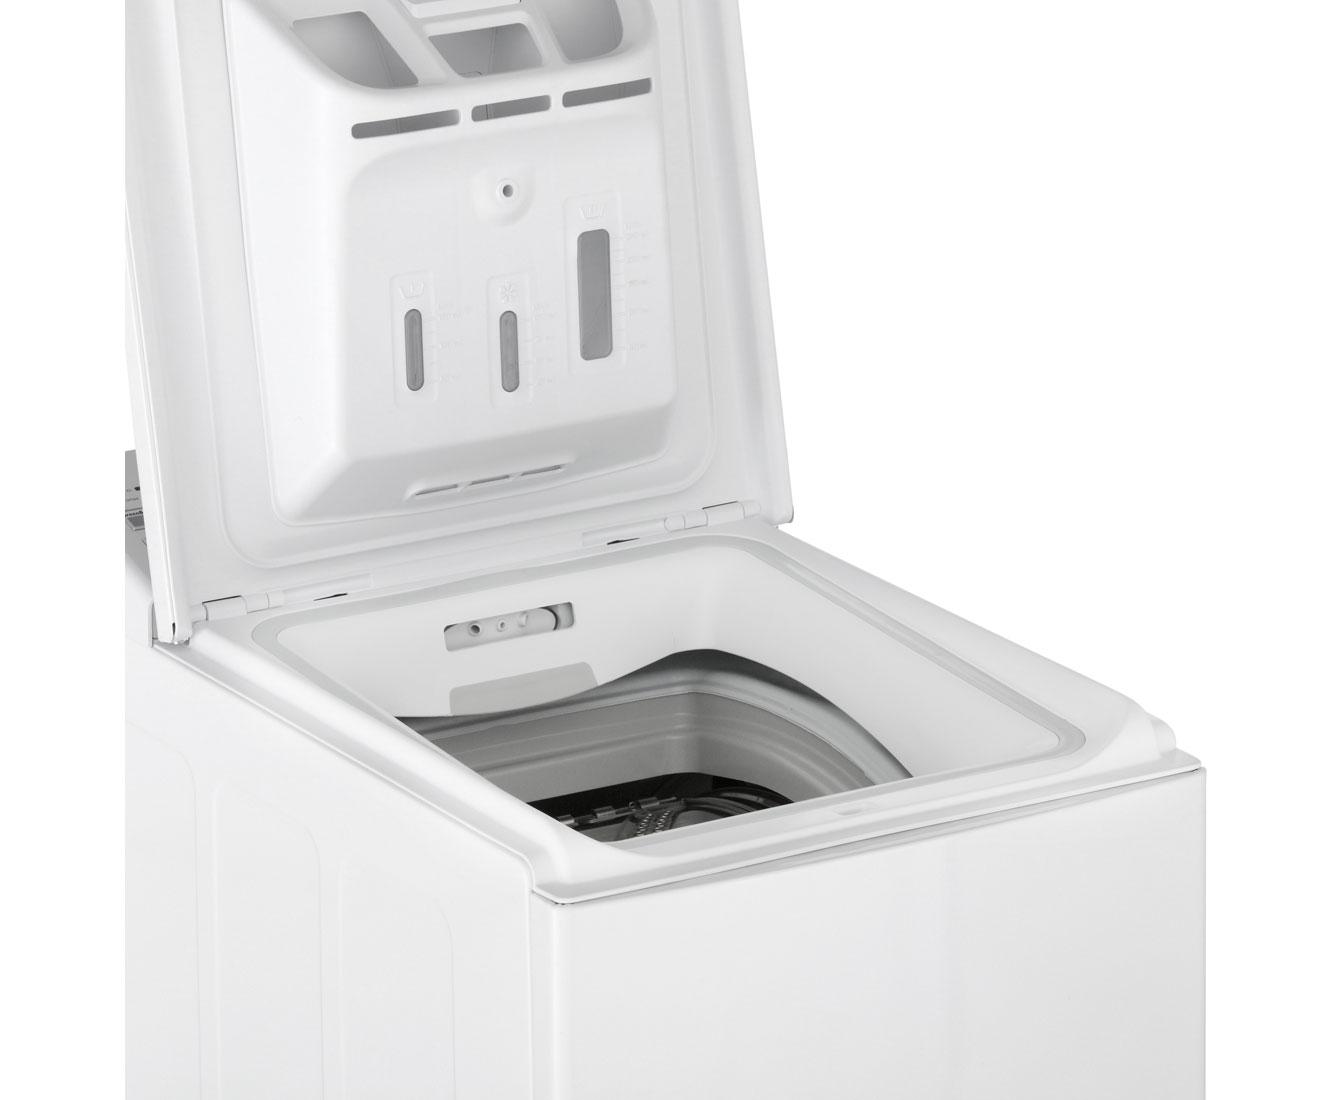 Bauknecht wat prime 652 z waschmaschine toplader 6 kg 1200 u min a